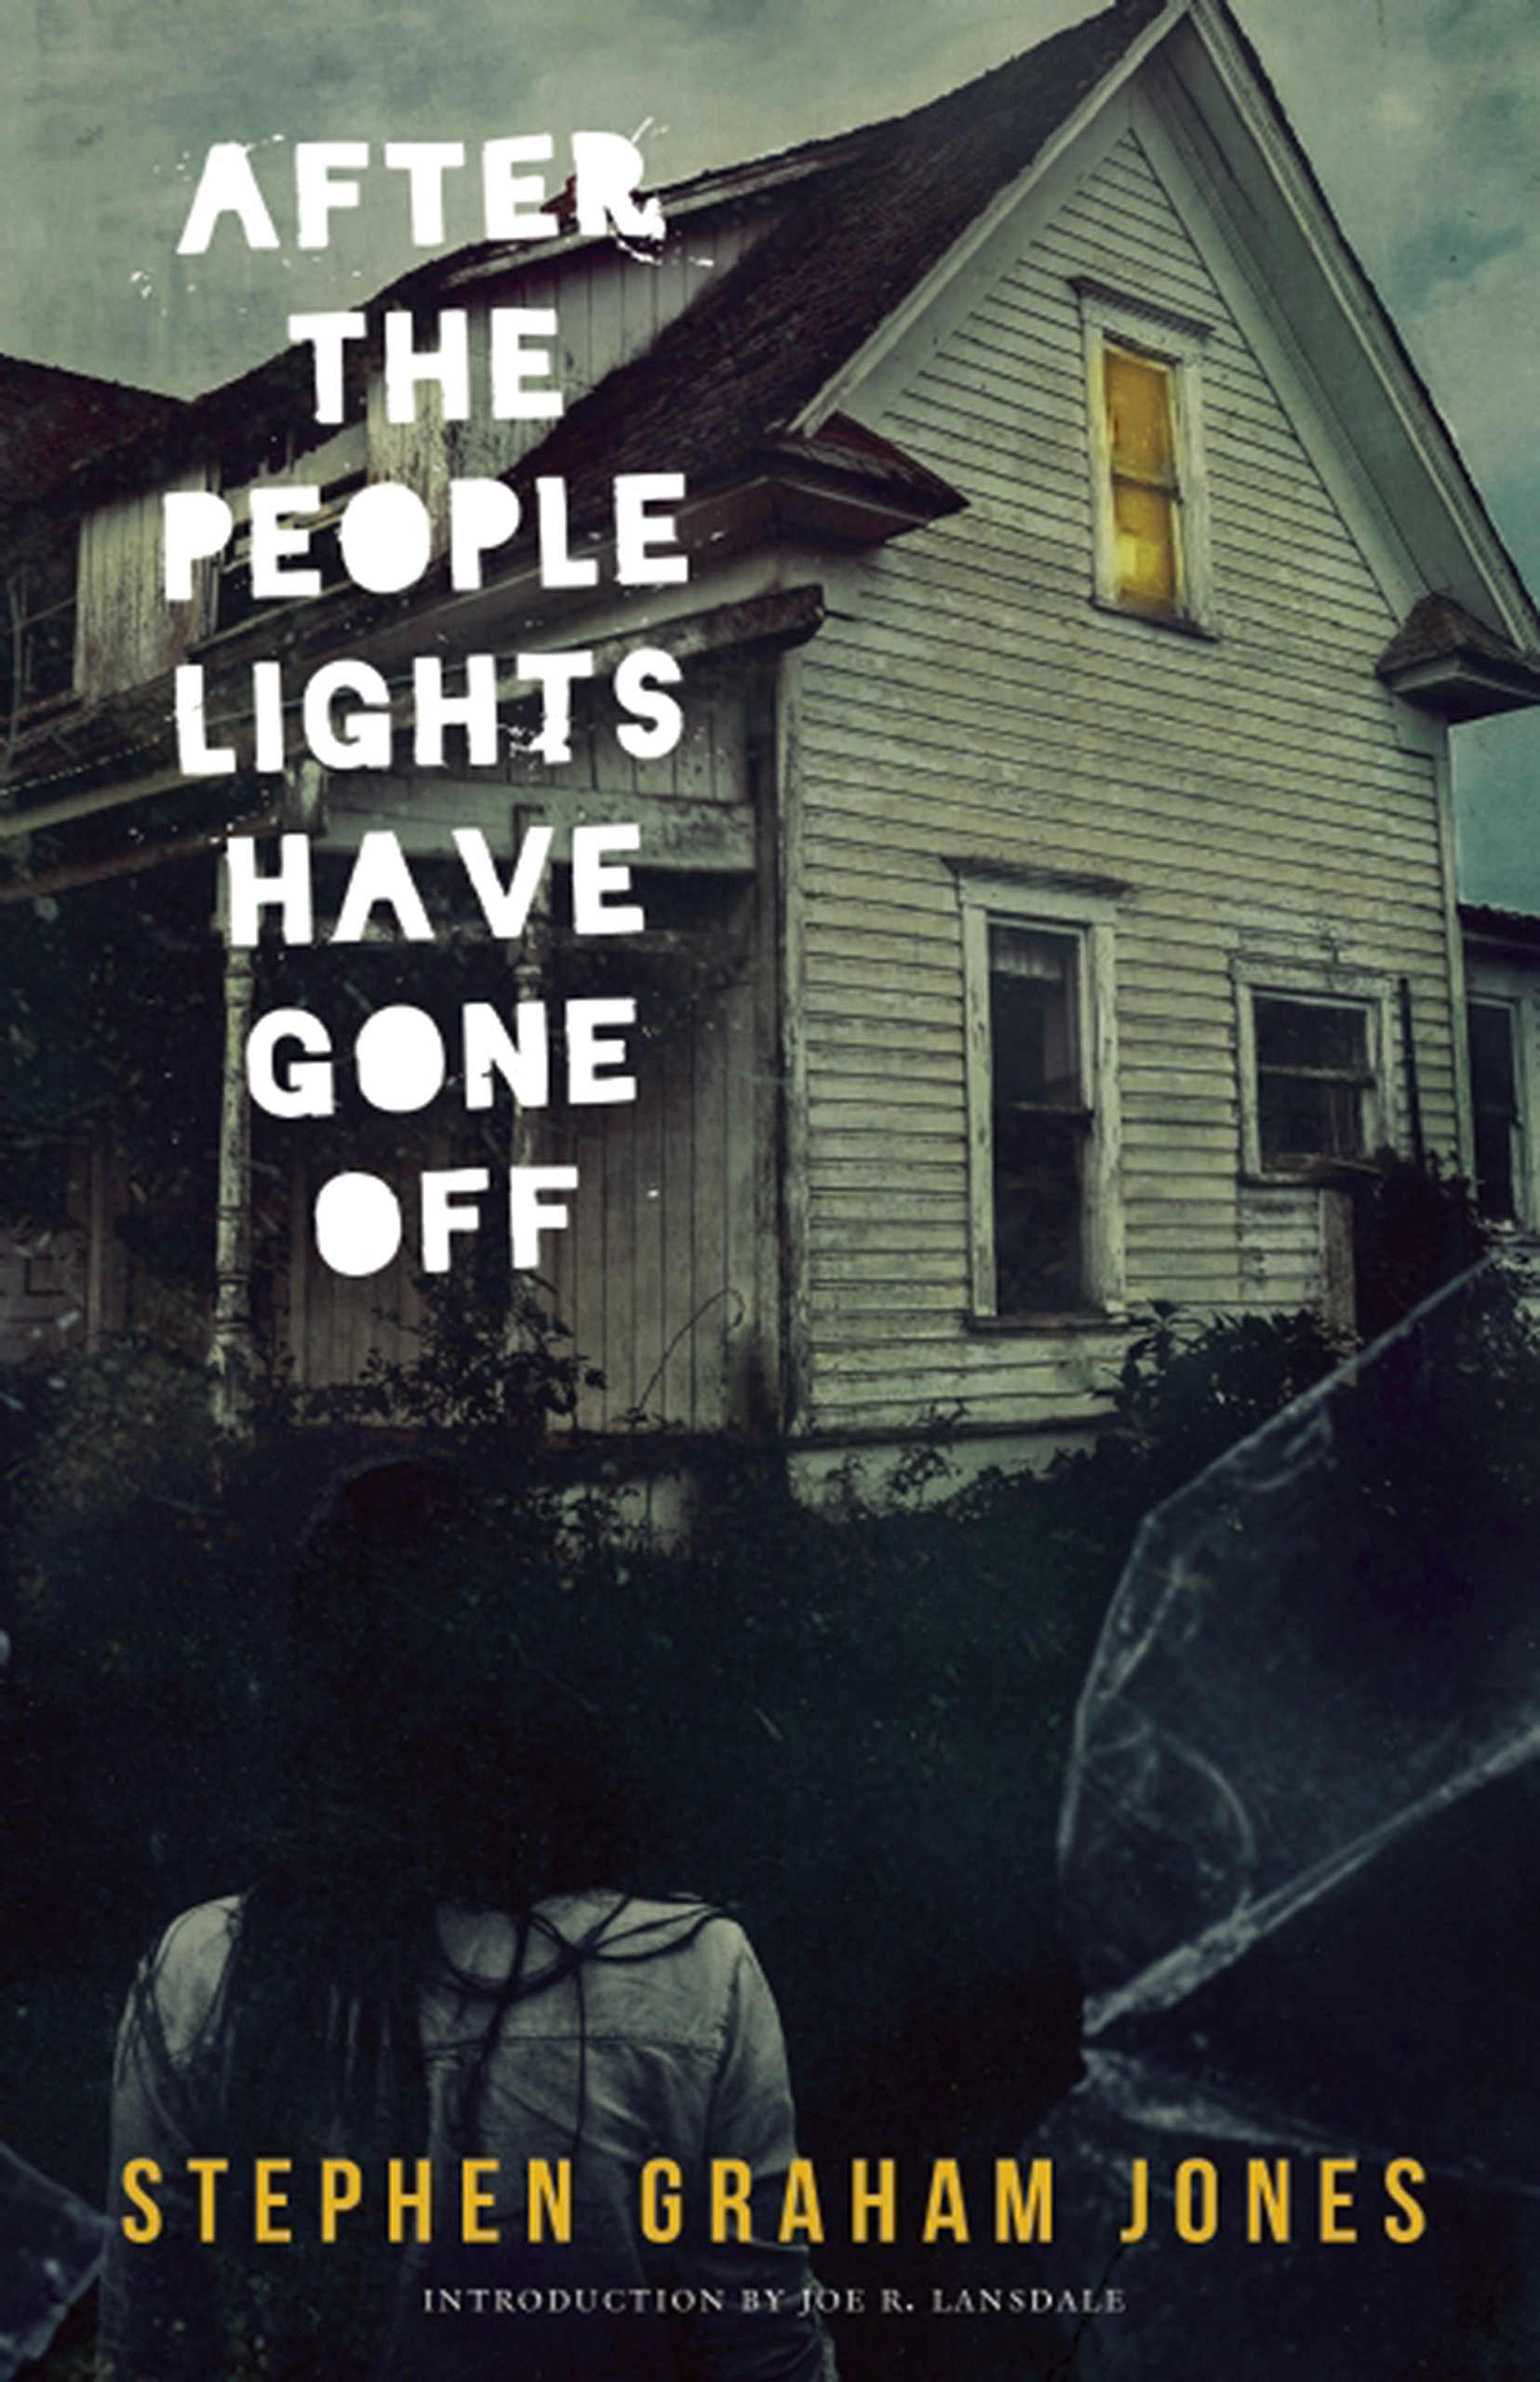 Image result for after the people lights have gone off